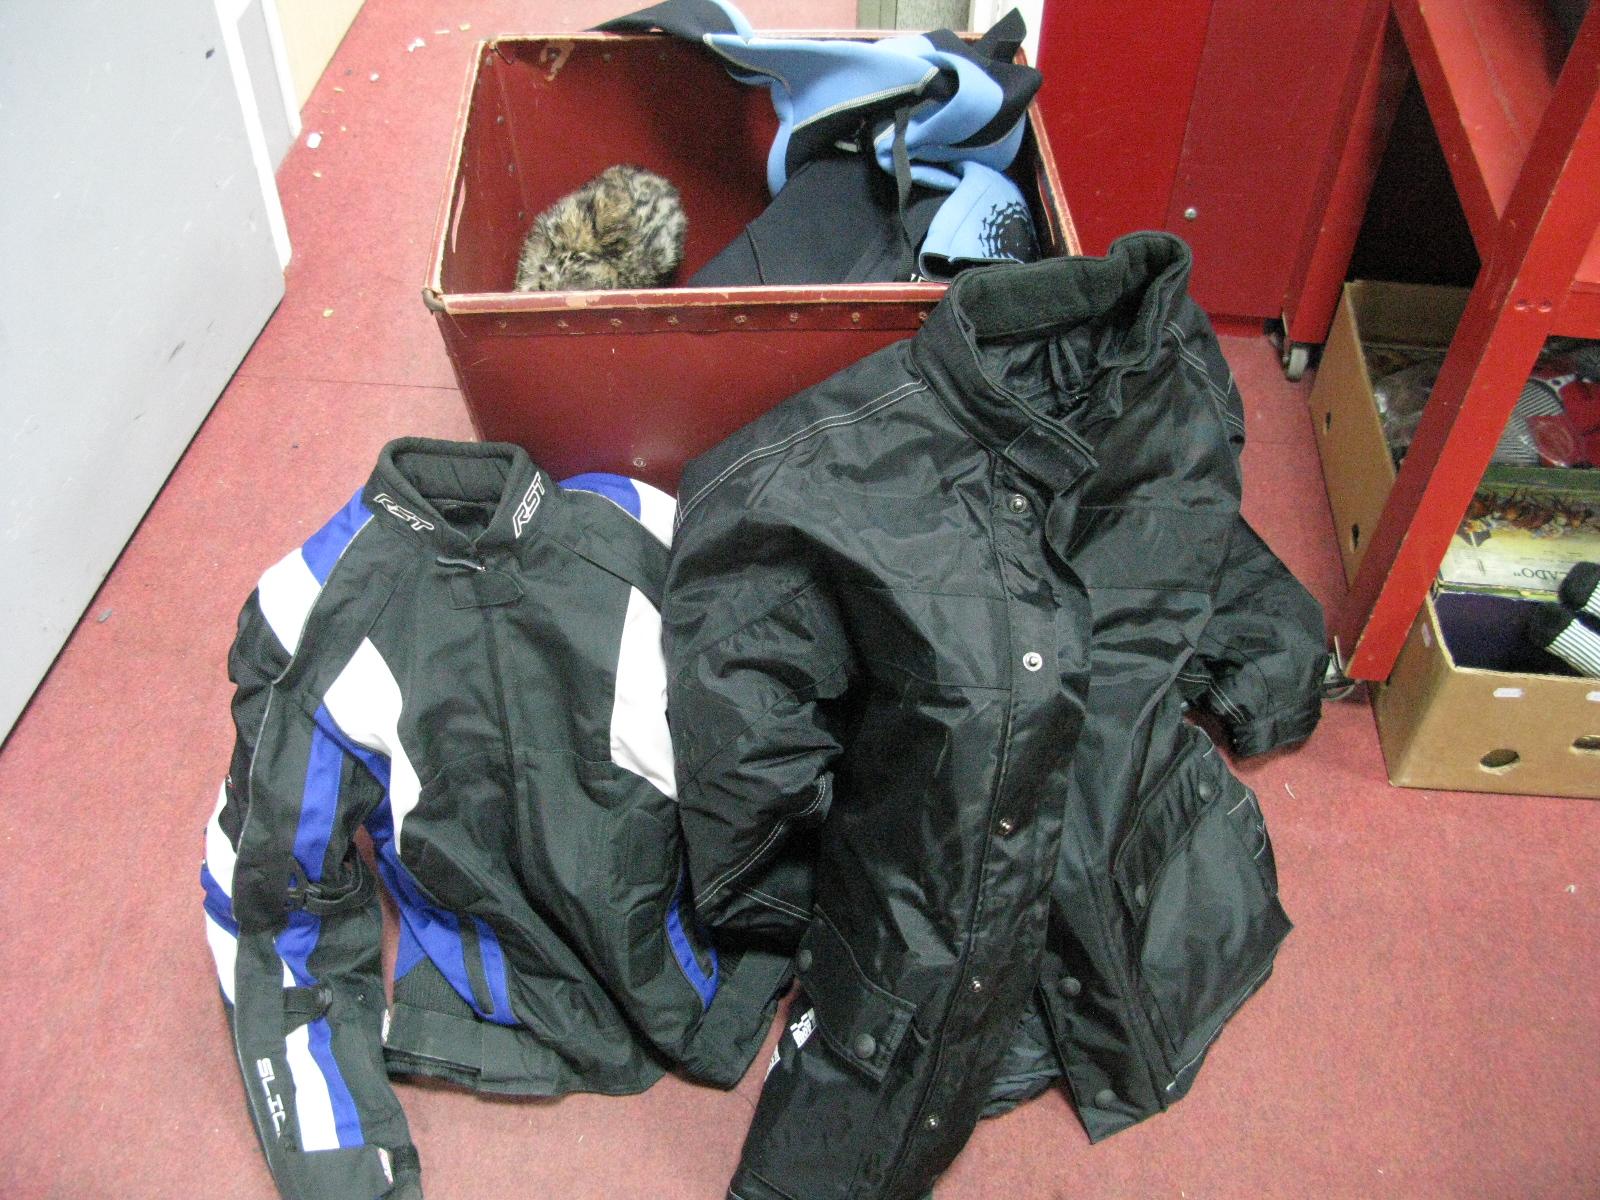 Lot 1030 - Motorcycle Boots - Blytz, Richa, Frank Thomas, gloves, RST and bearing jackets, etc.